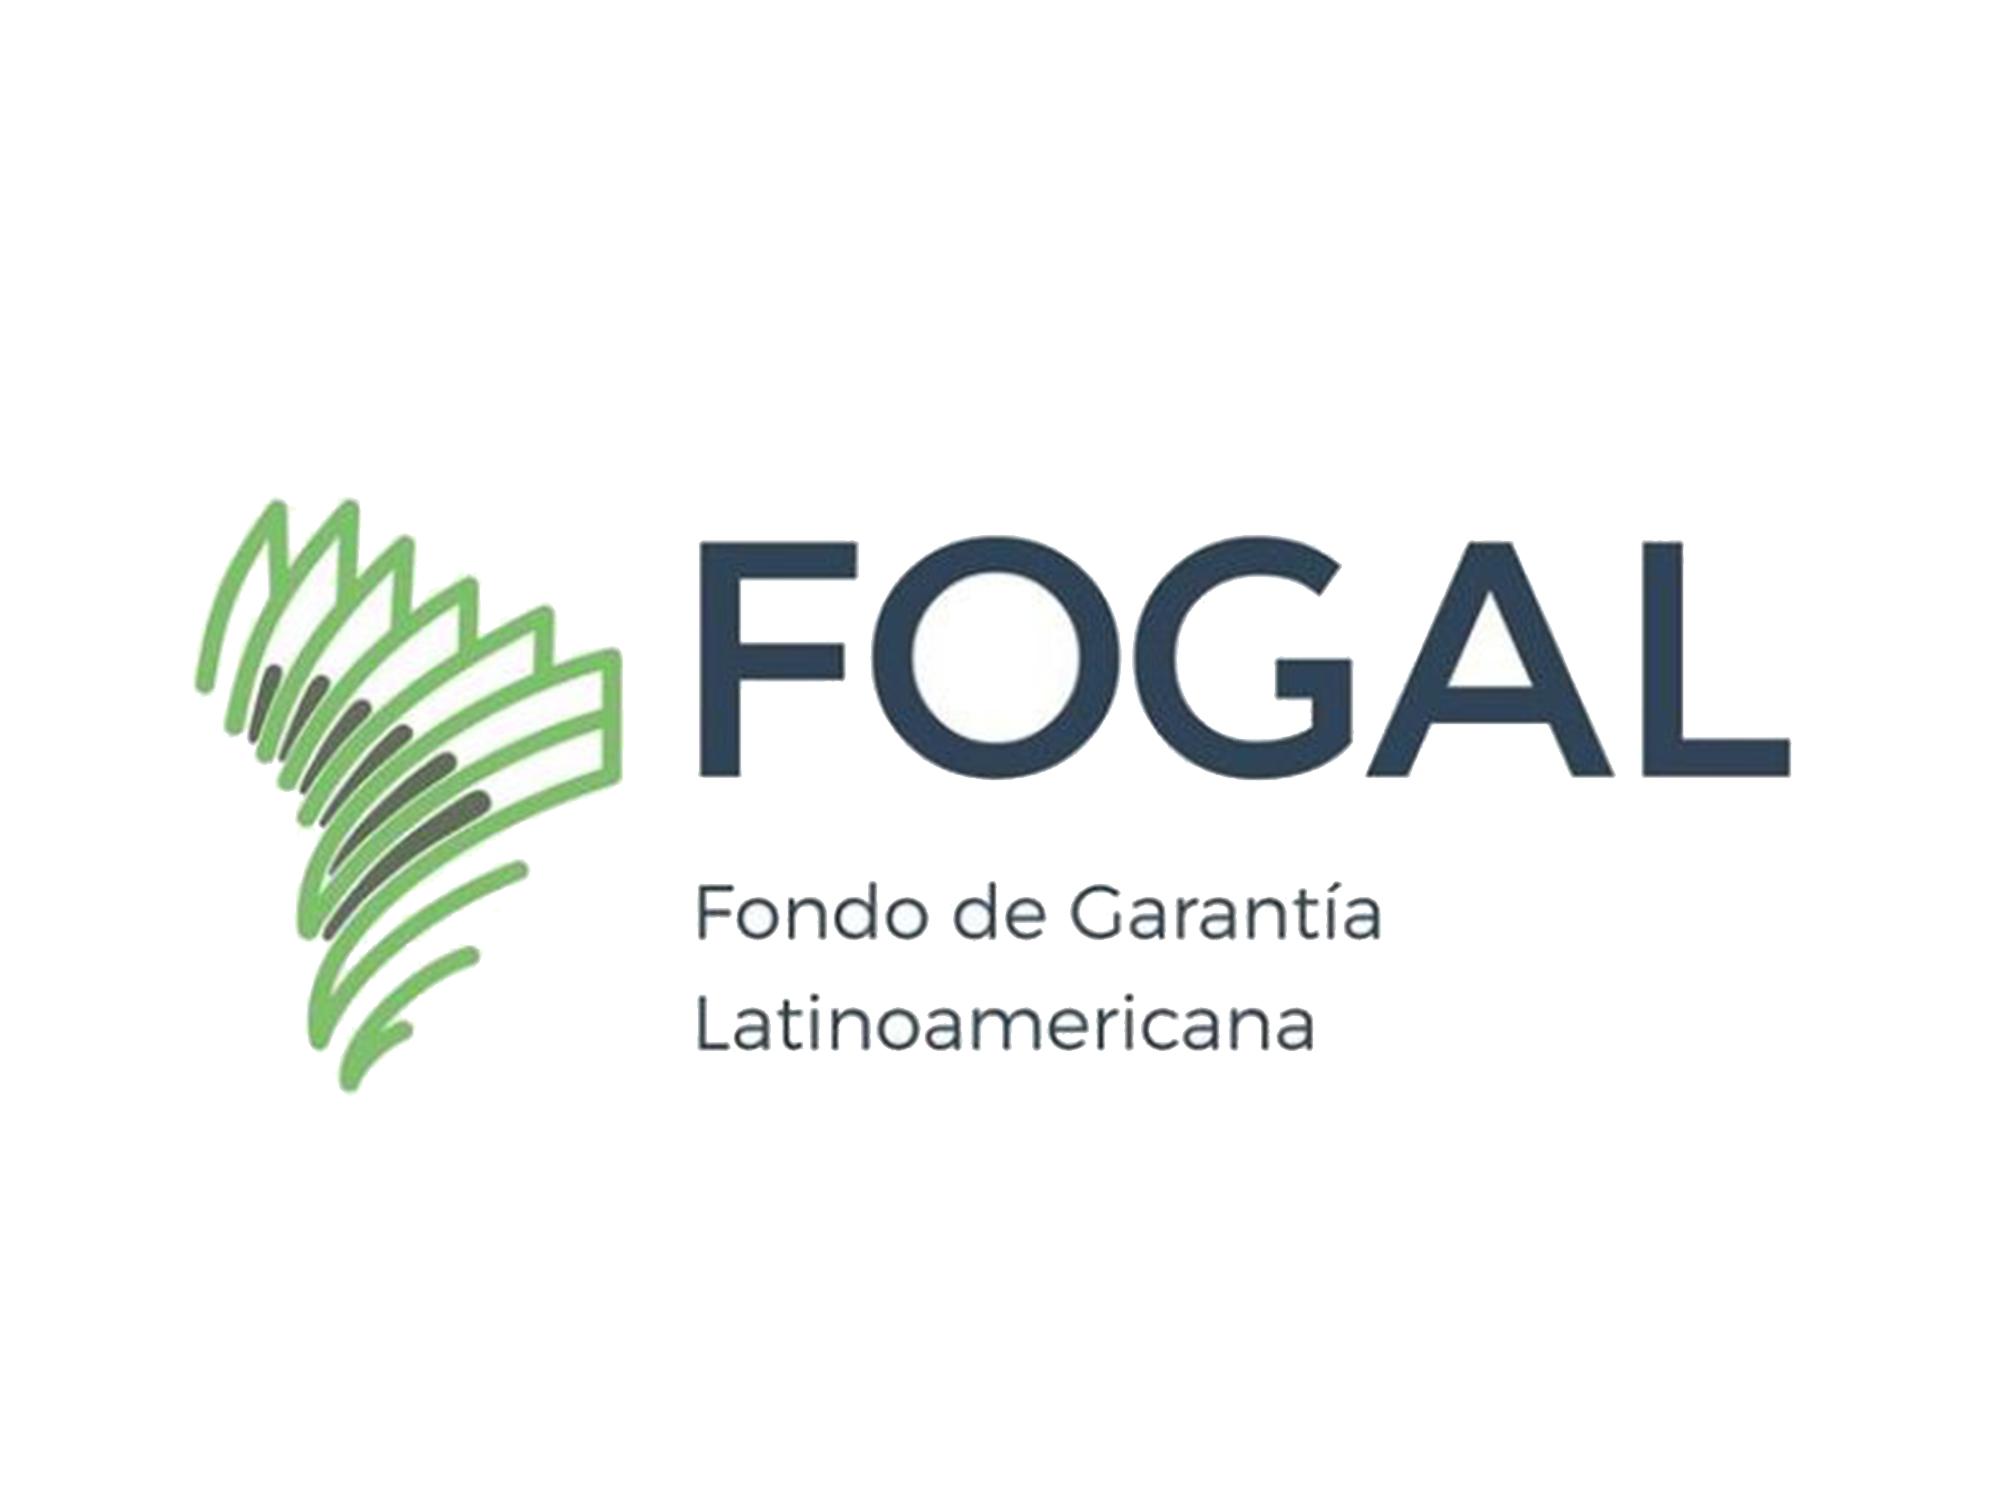 Logo FOGAL - Financiadores - Findepro